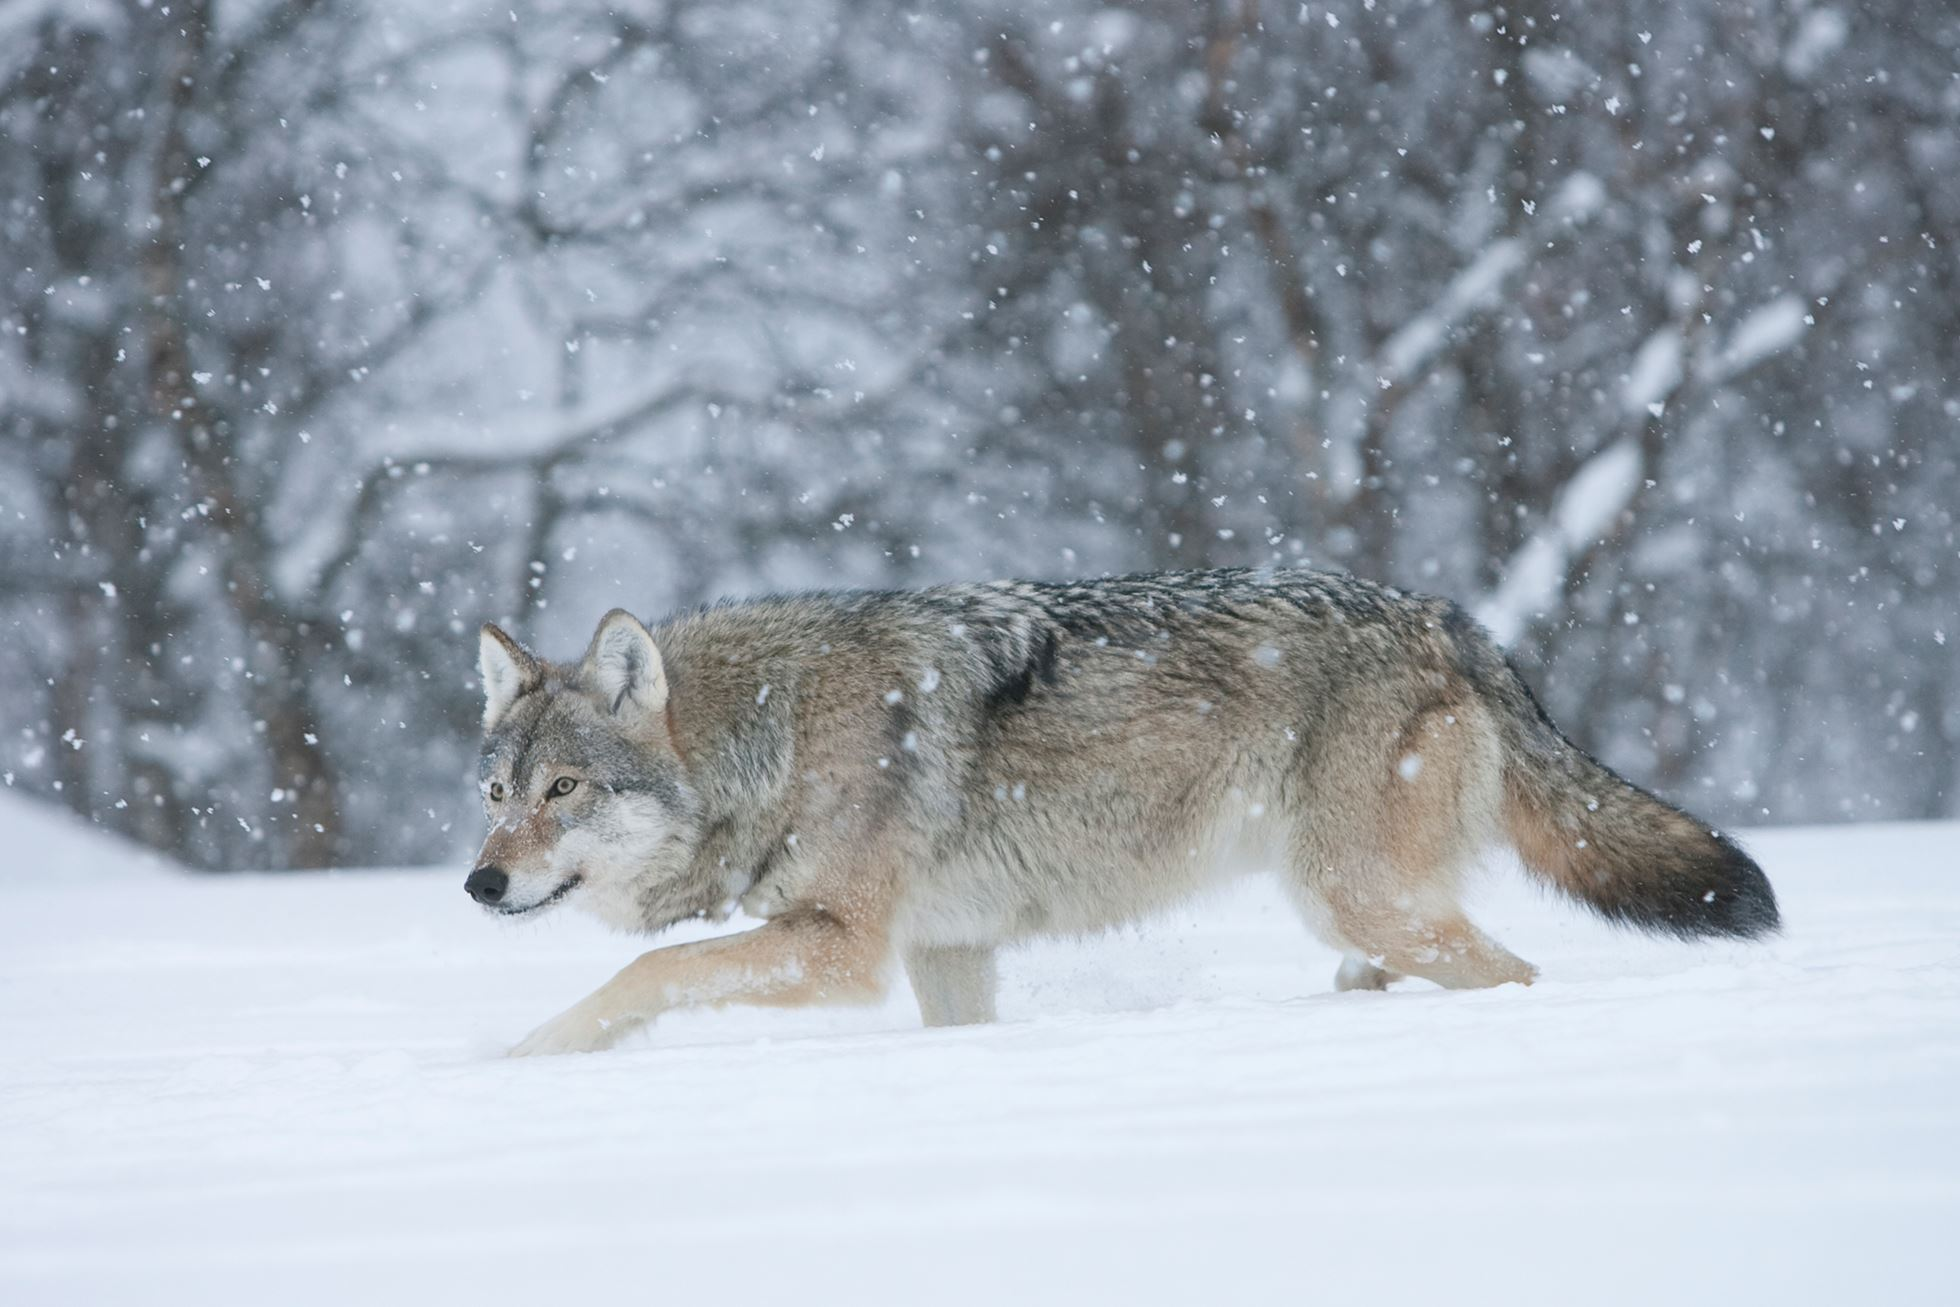 European wolf (Canis lupus) in winter birch forest, Norway (c)